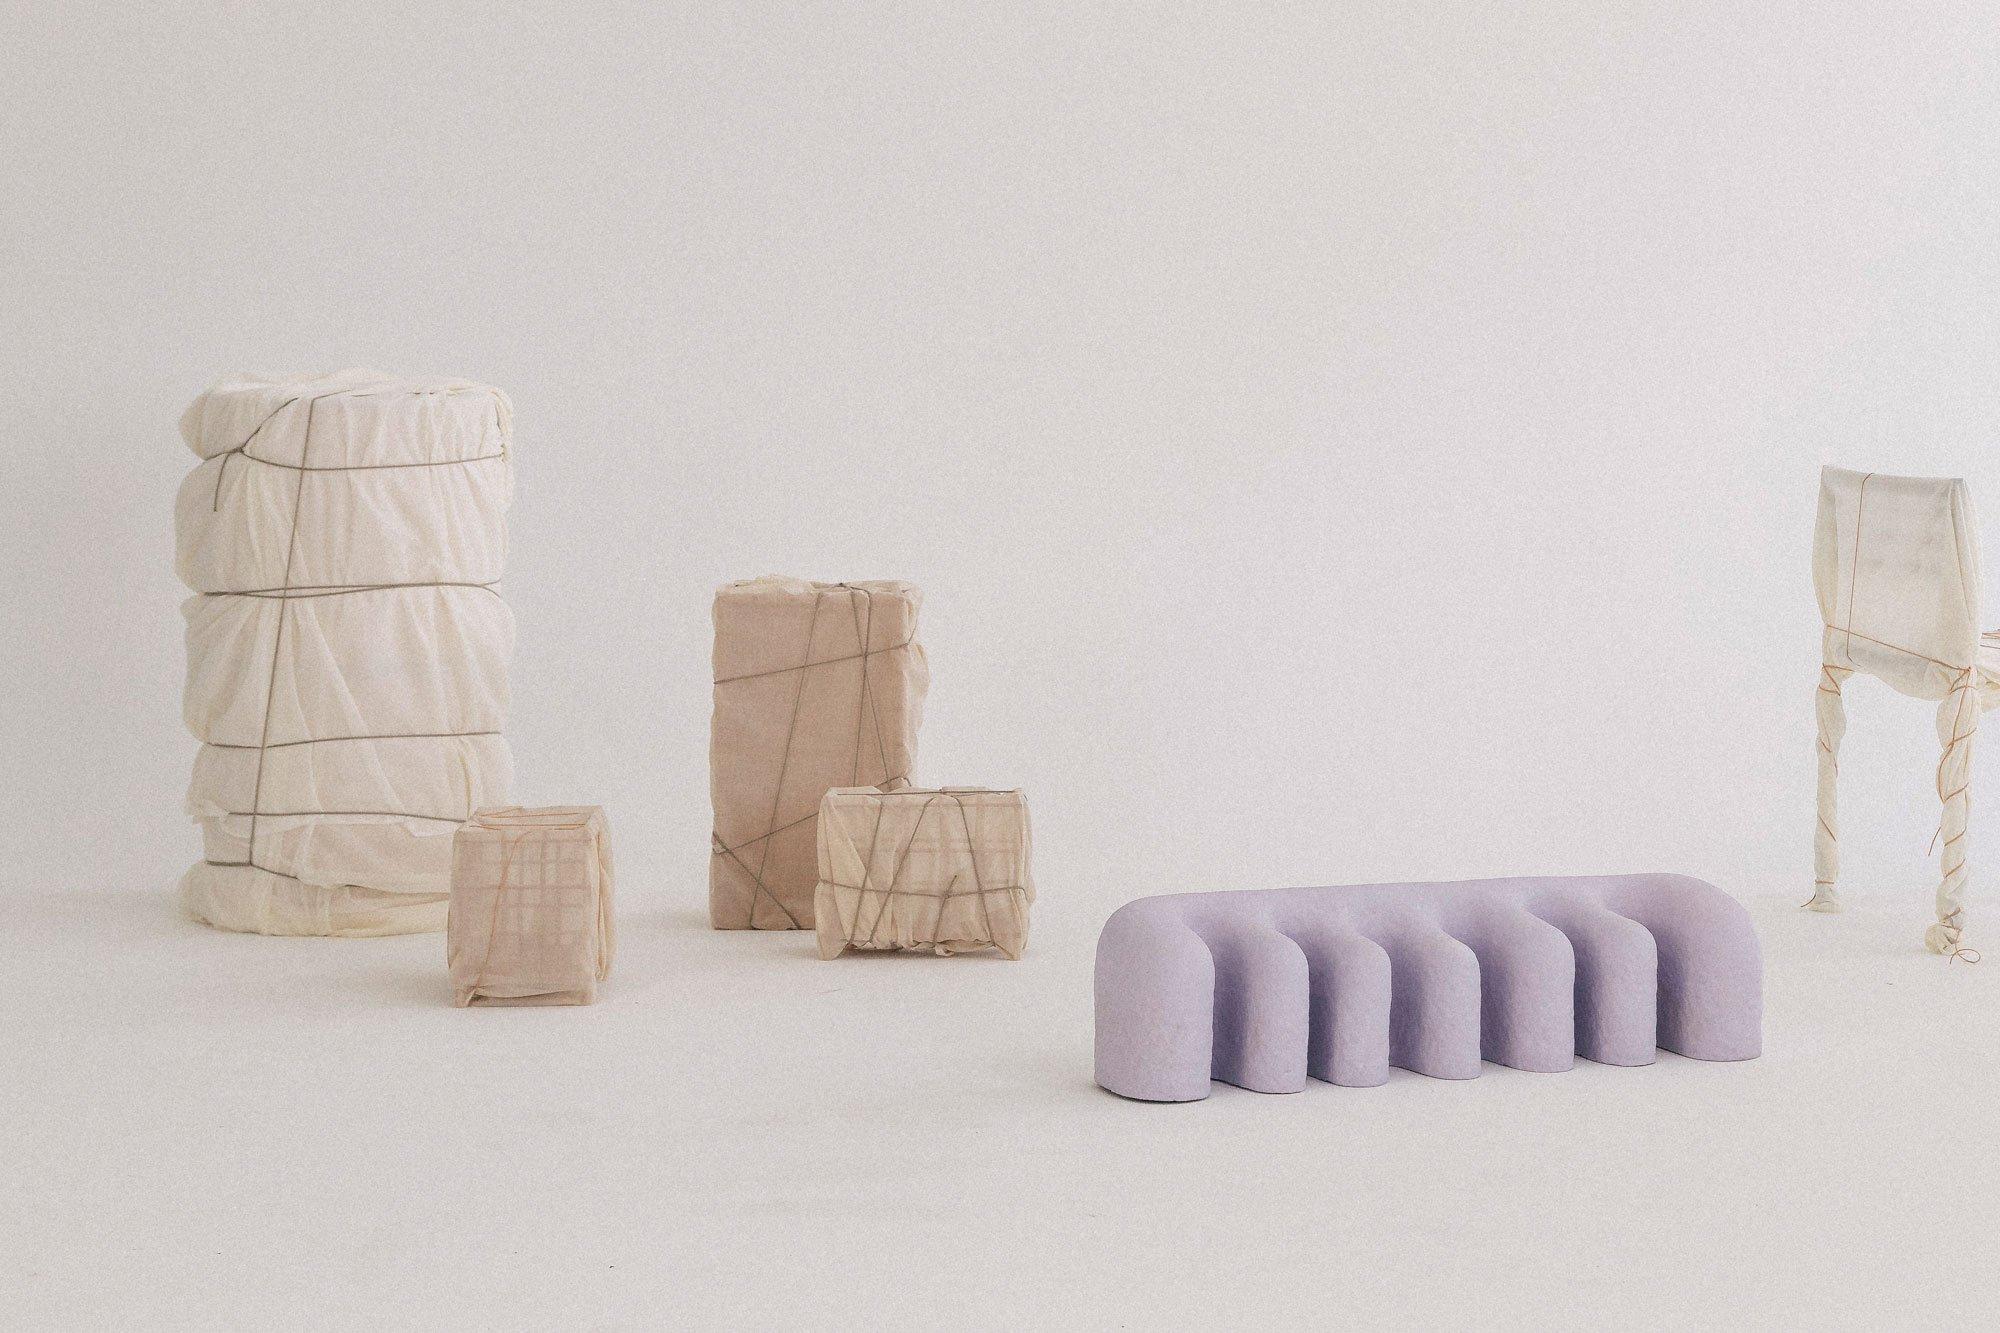 Ukurant Objects, 3daysofdesign 2020, jeunes designers, Sisse Holst Pedersen